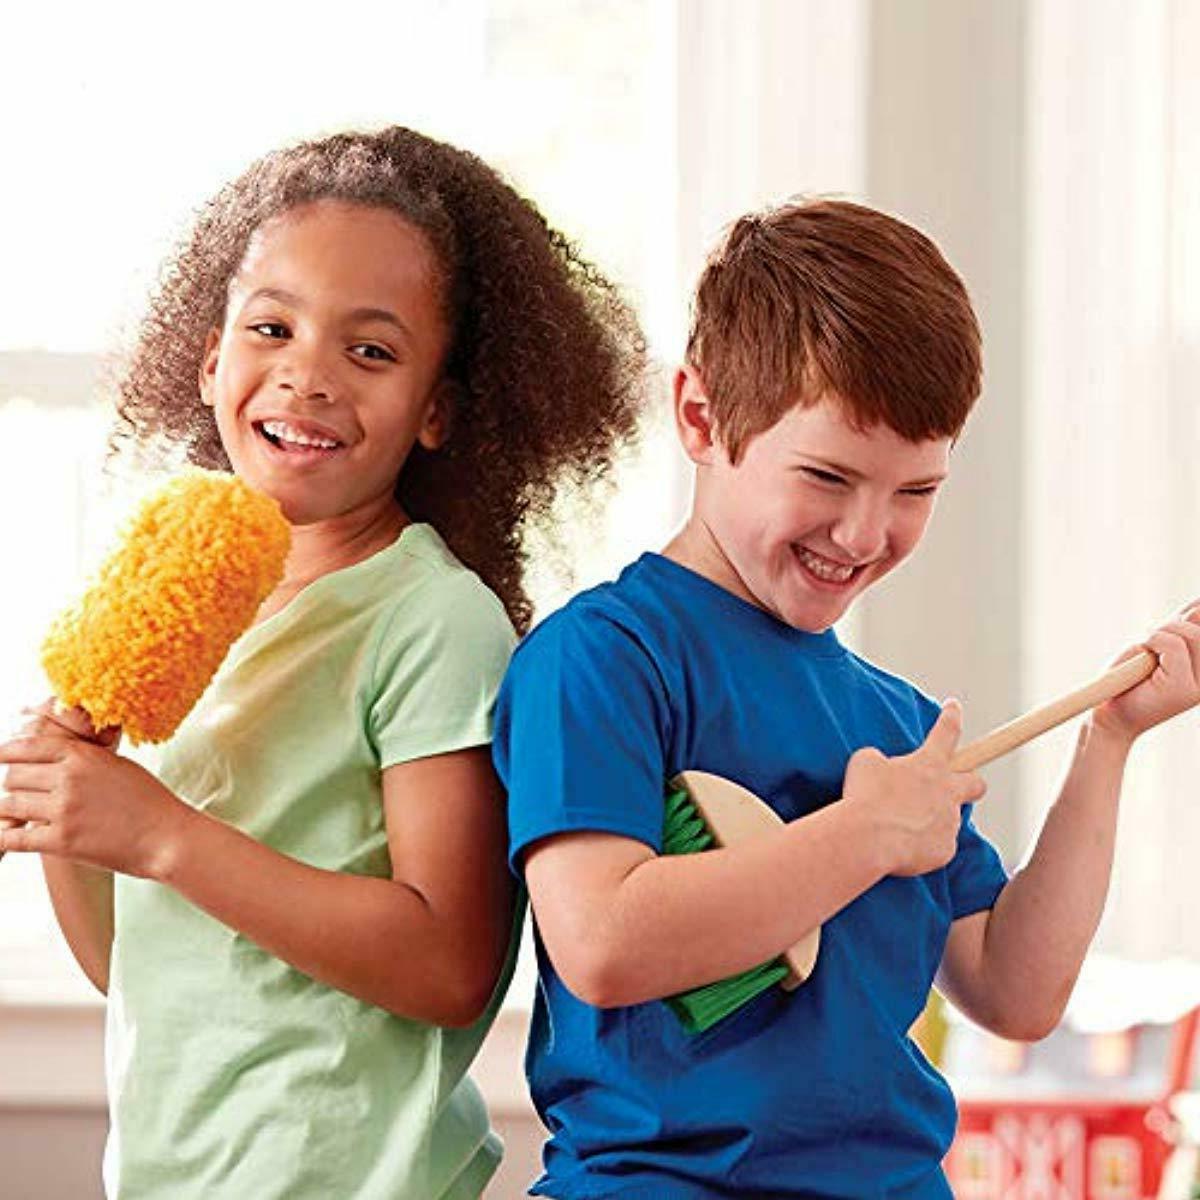 Melissa & Doug, Play House! Mop! (6-piece,